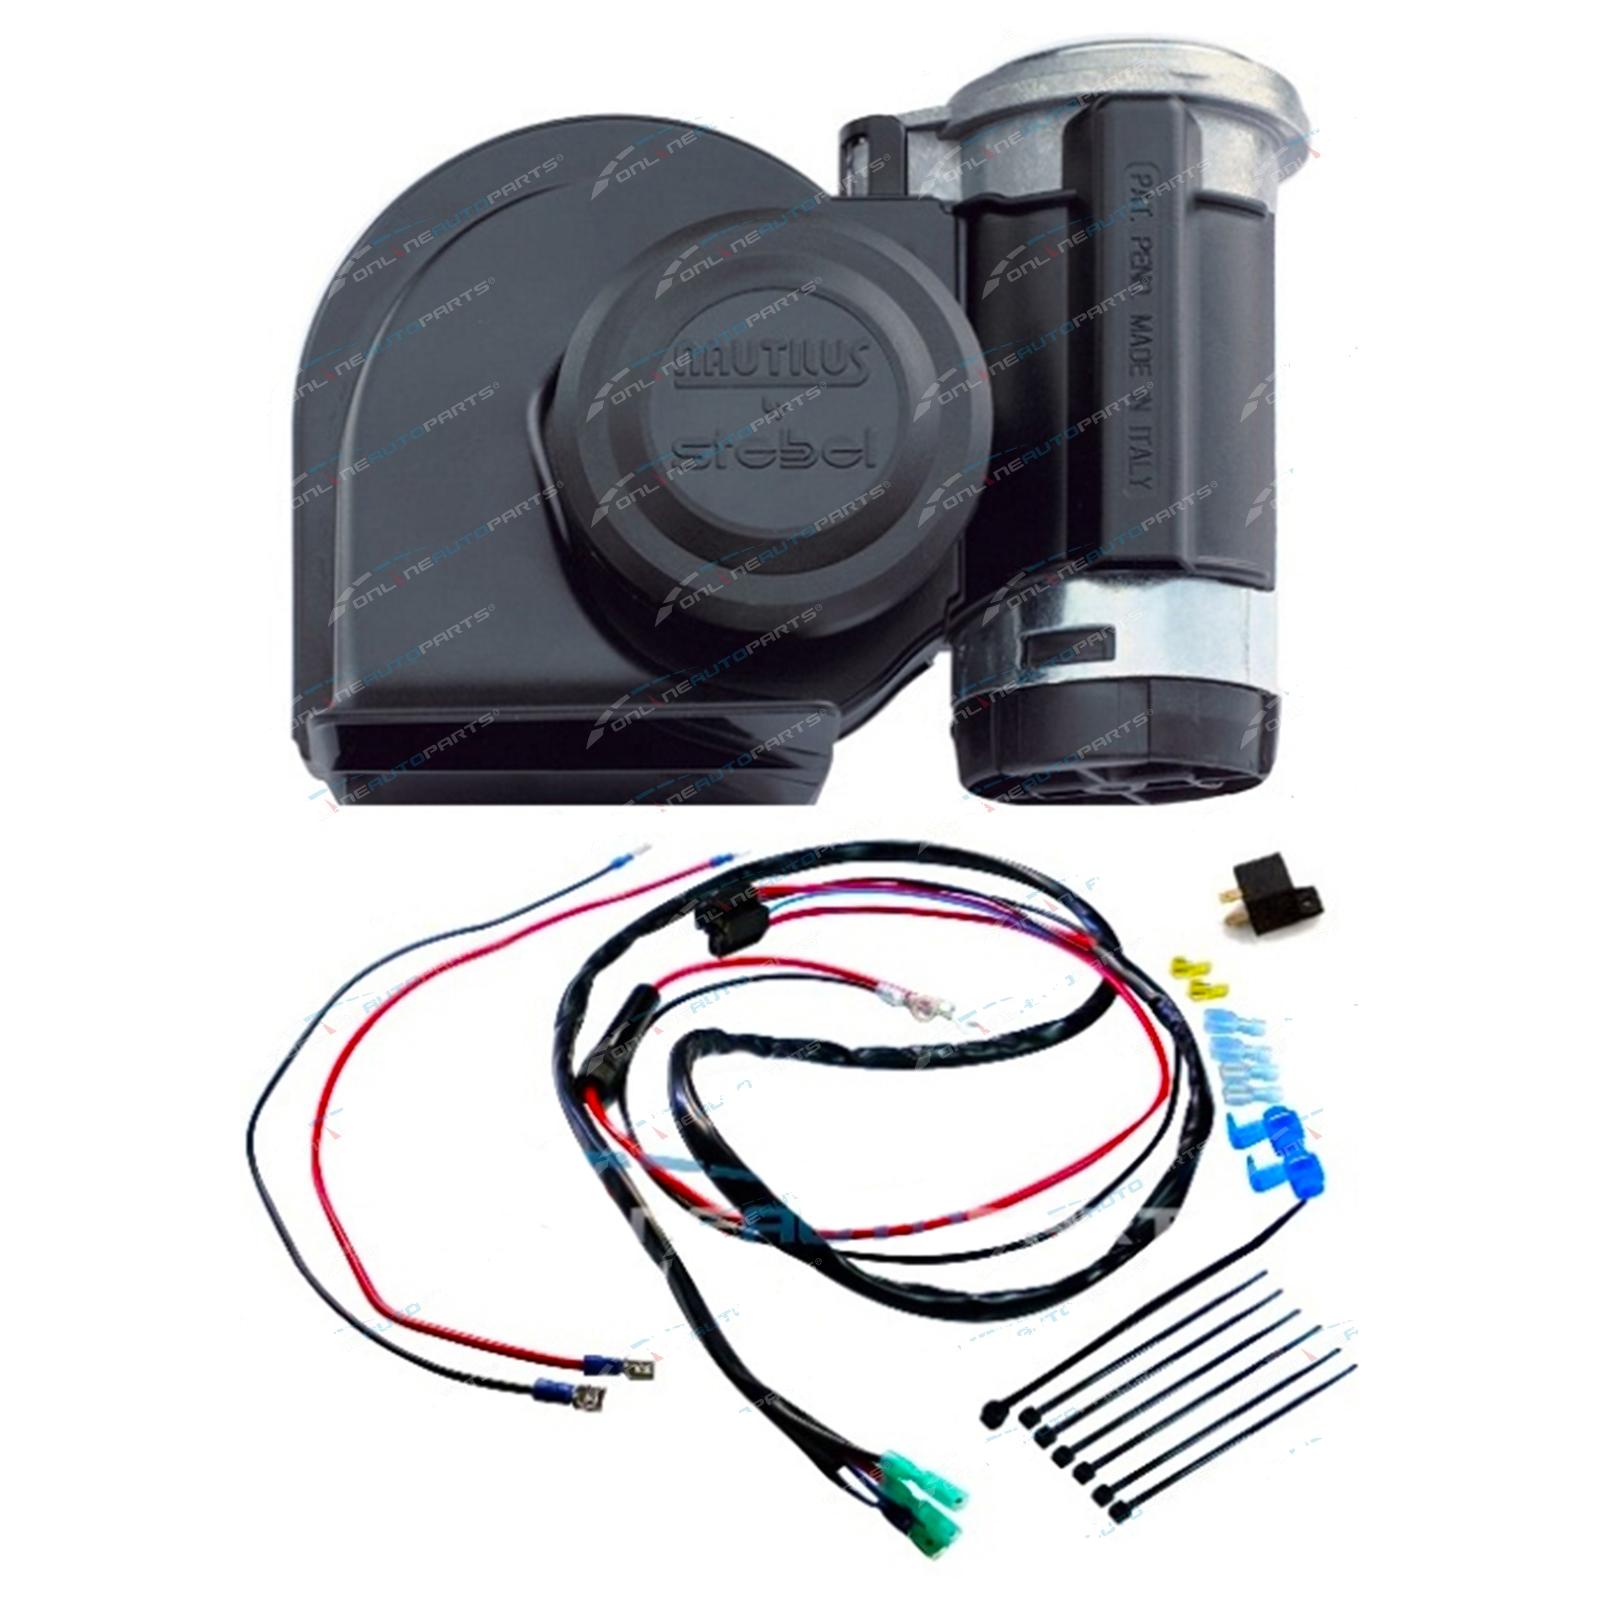 hight resolution of stebel nautilus black car air horn kit 12 volt 139db incl plug n horn relay wiring kit plug n play stebel nautilus air electric car